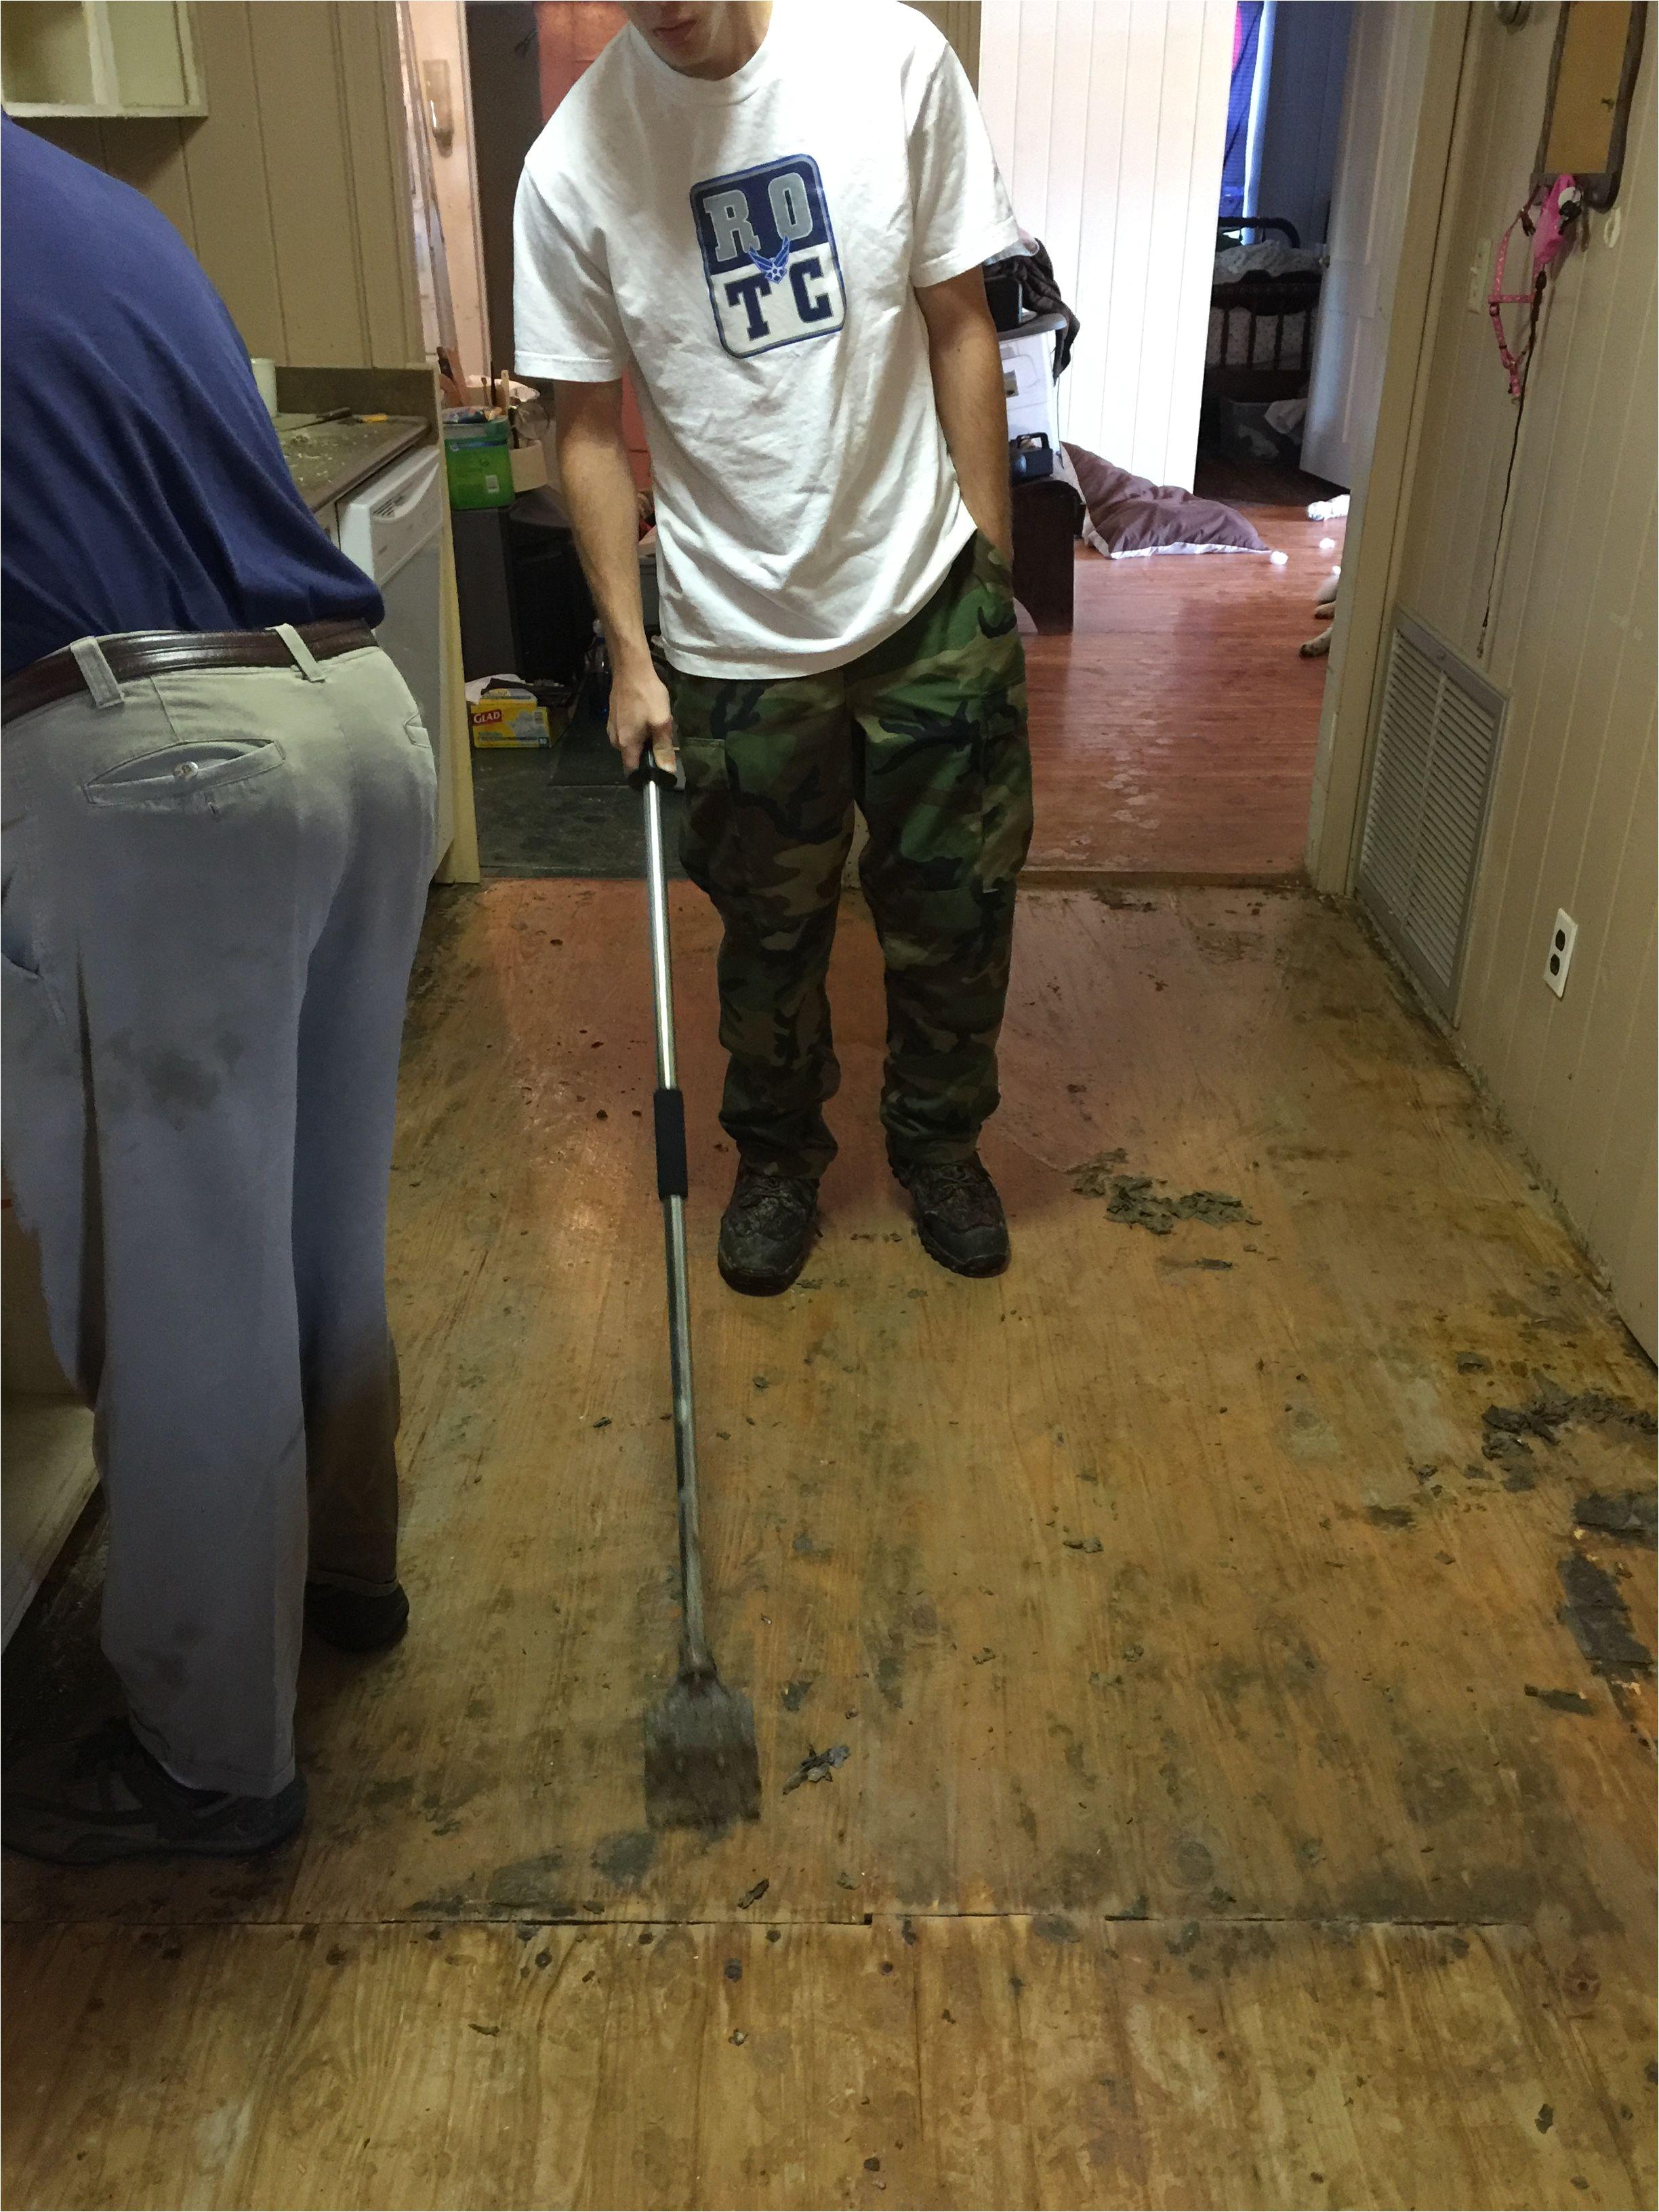 Wood Floor Scraper Scraping the Floor after Pulling Up Linoleum sorry It S Sideways